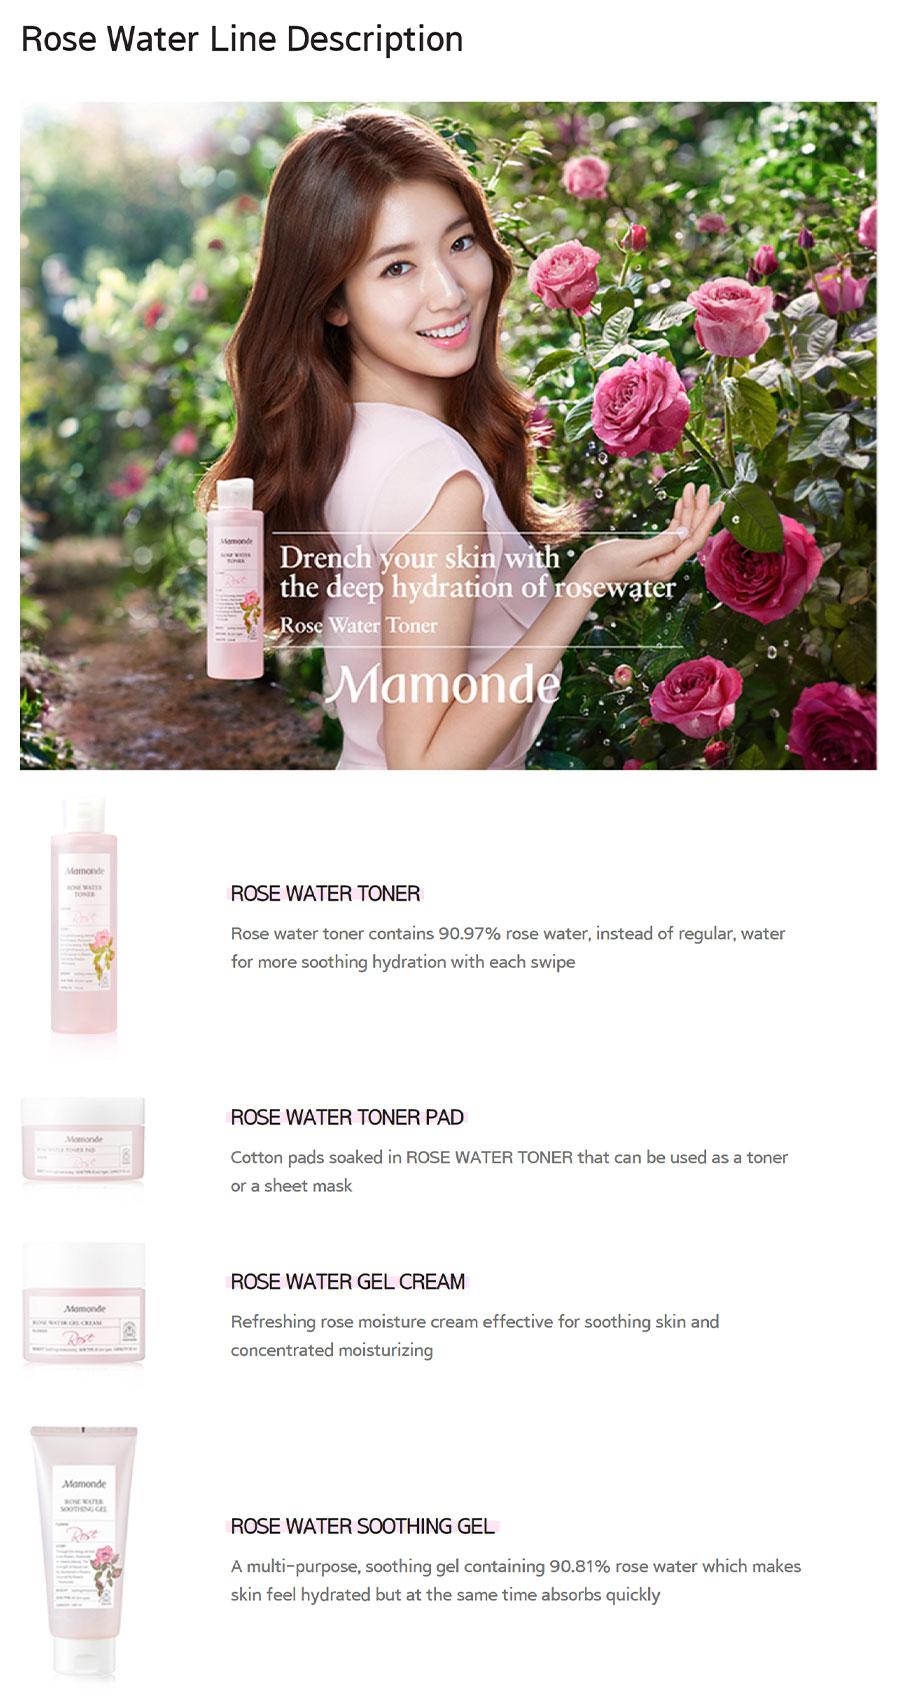 Rose Water Gel Cream - Rose line description